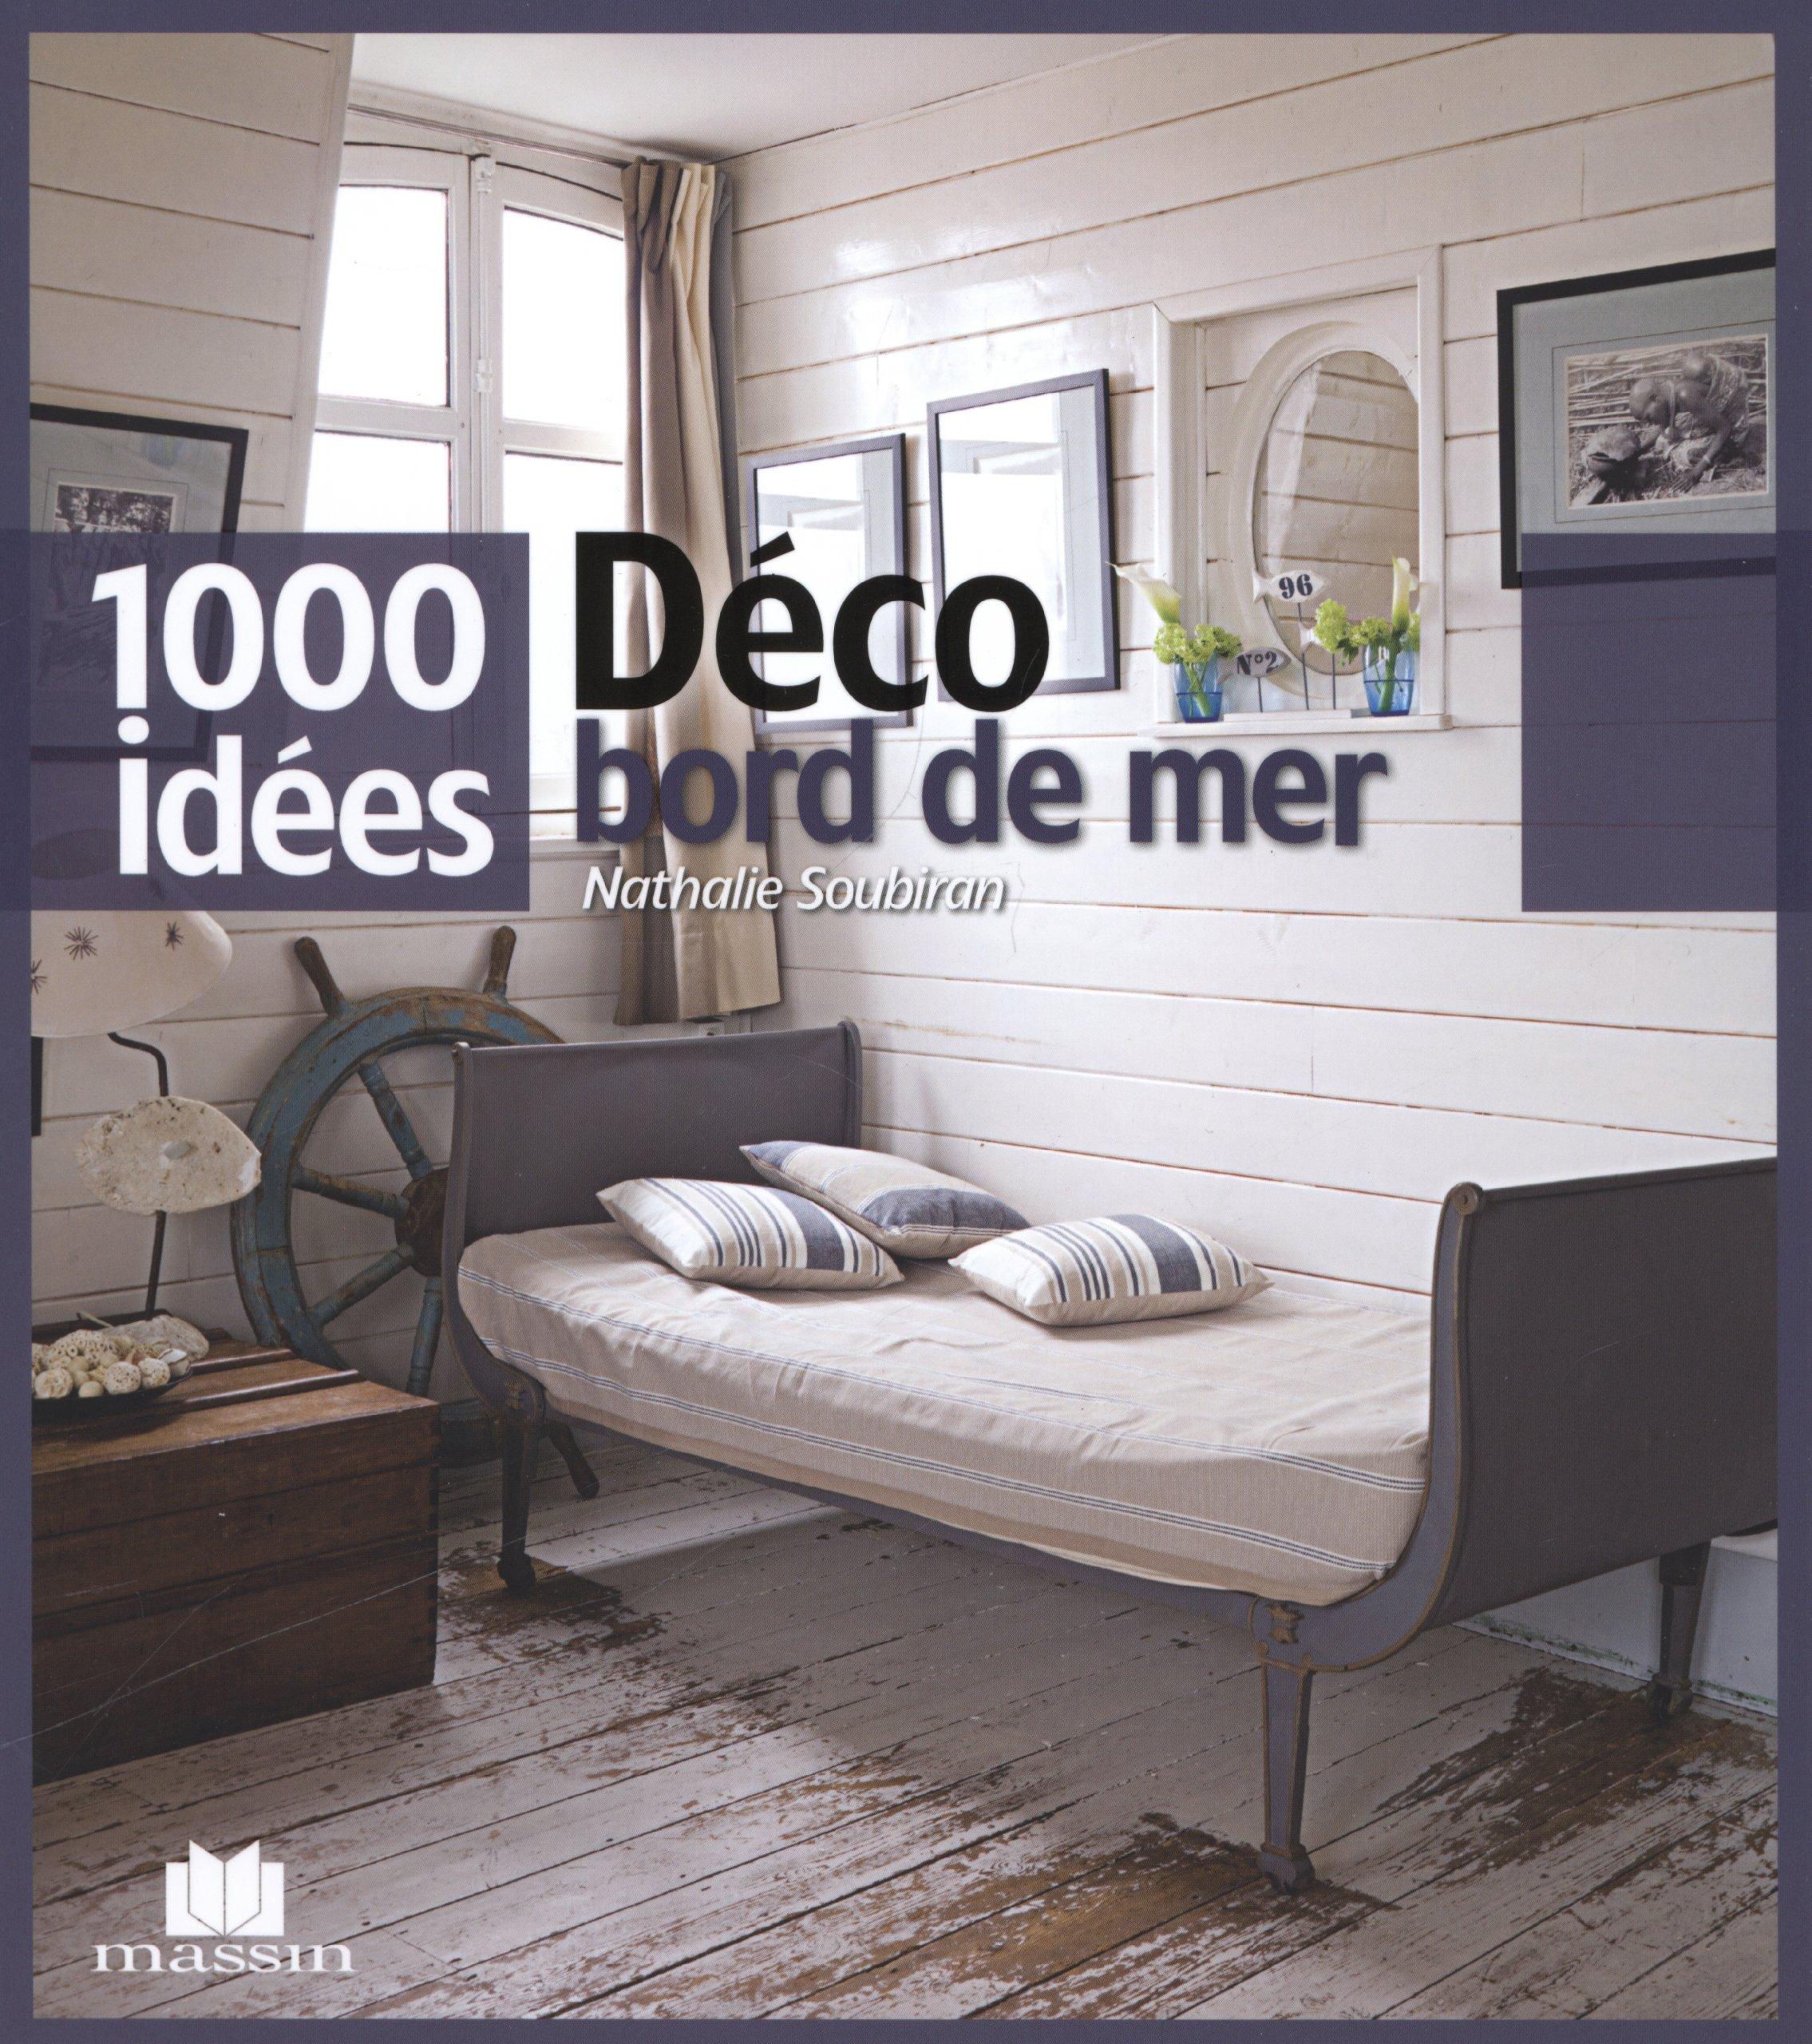 Déco Bord De Mer (French) Mass Market Paperback U2013 Jul 3 2013